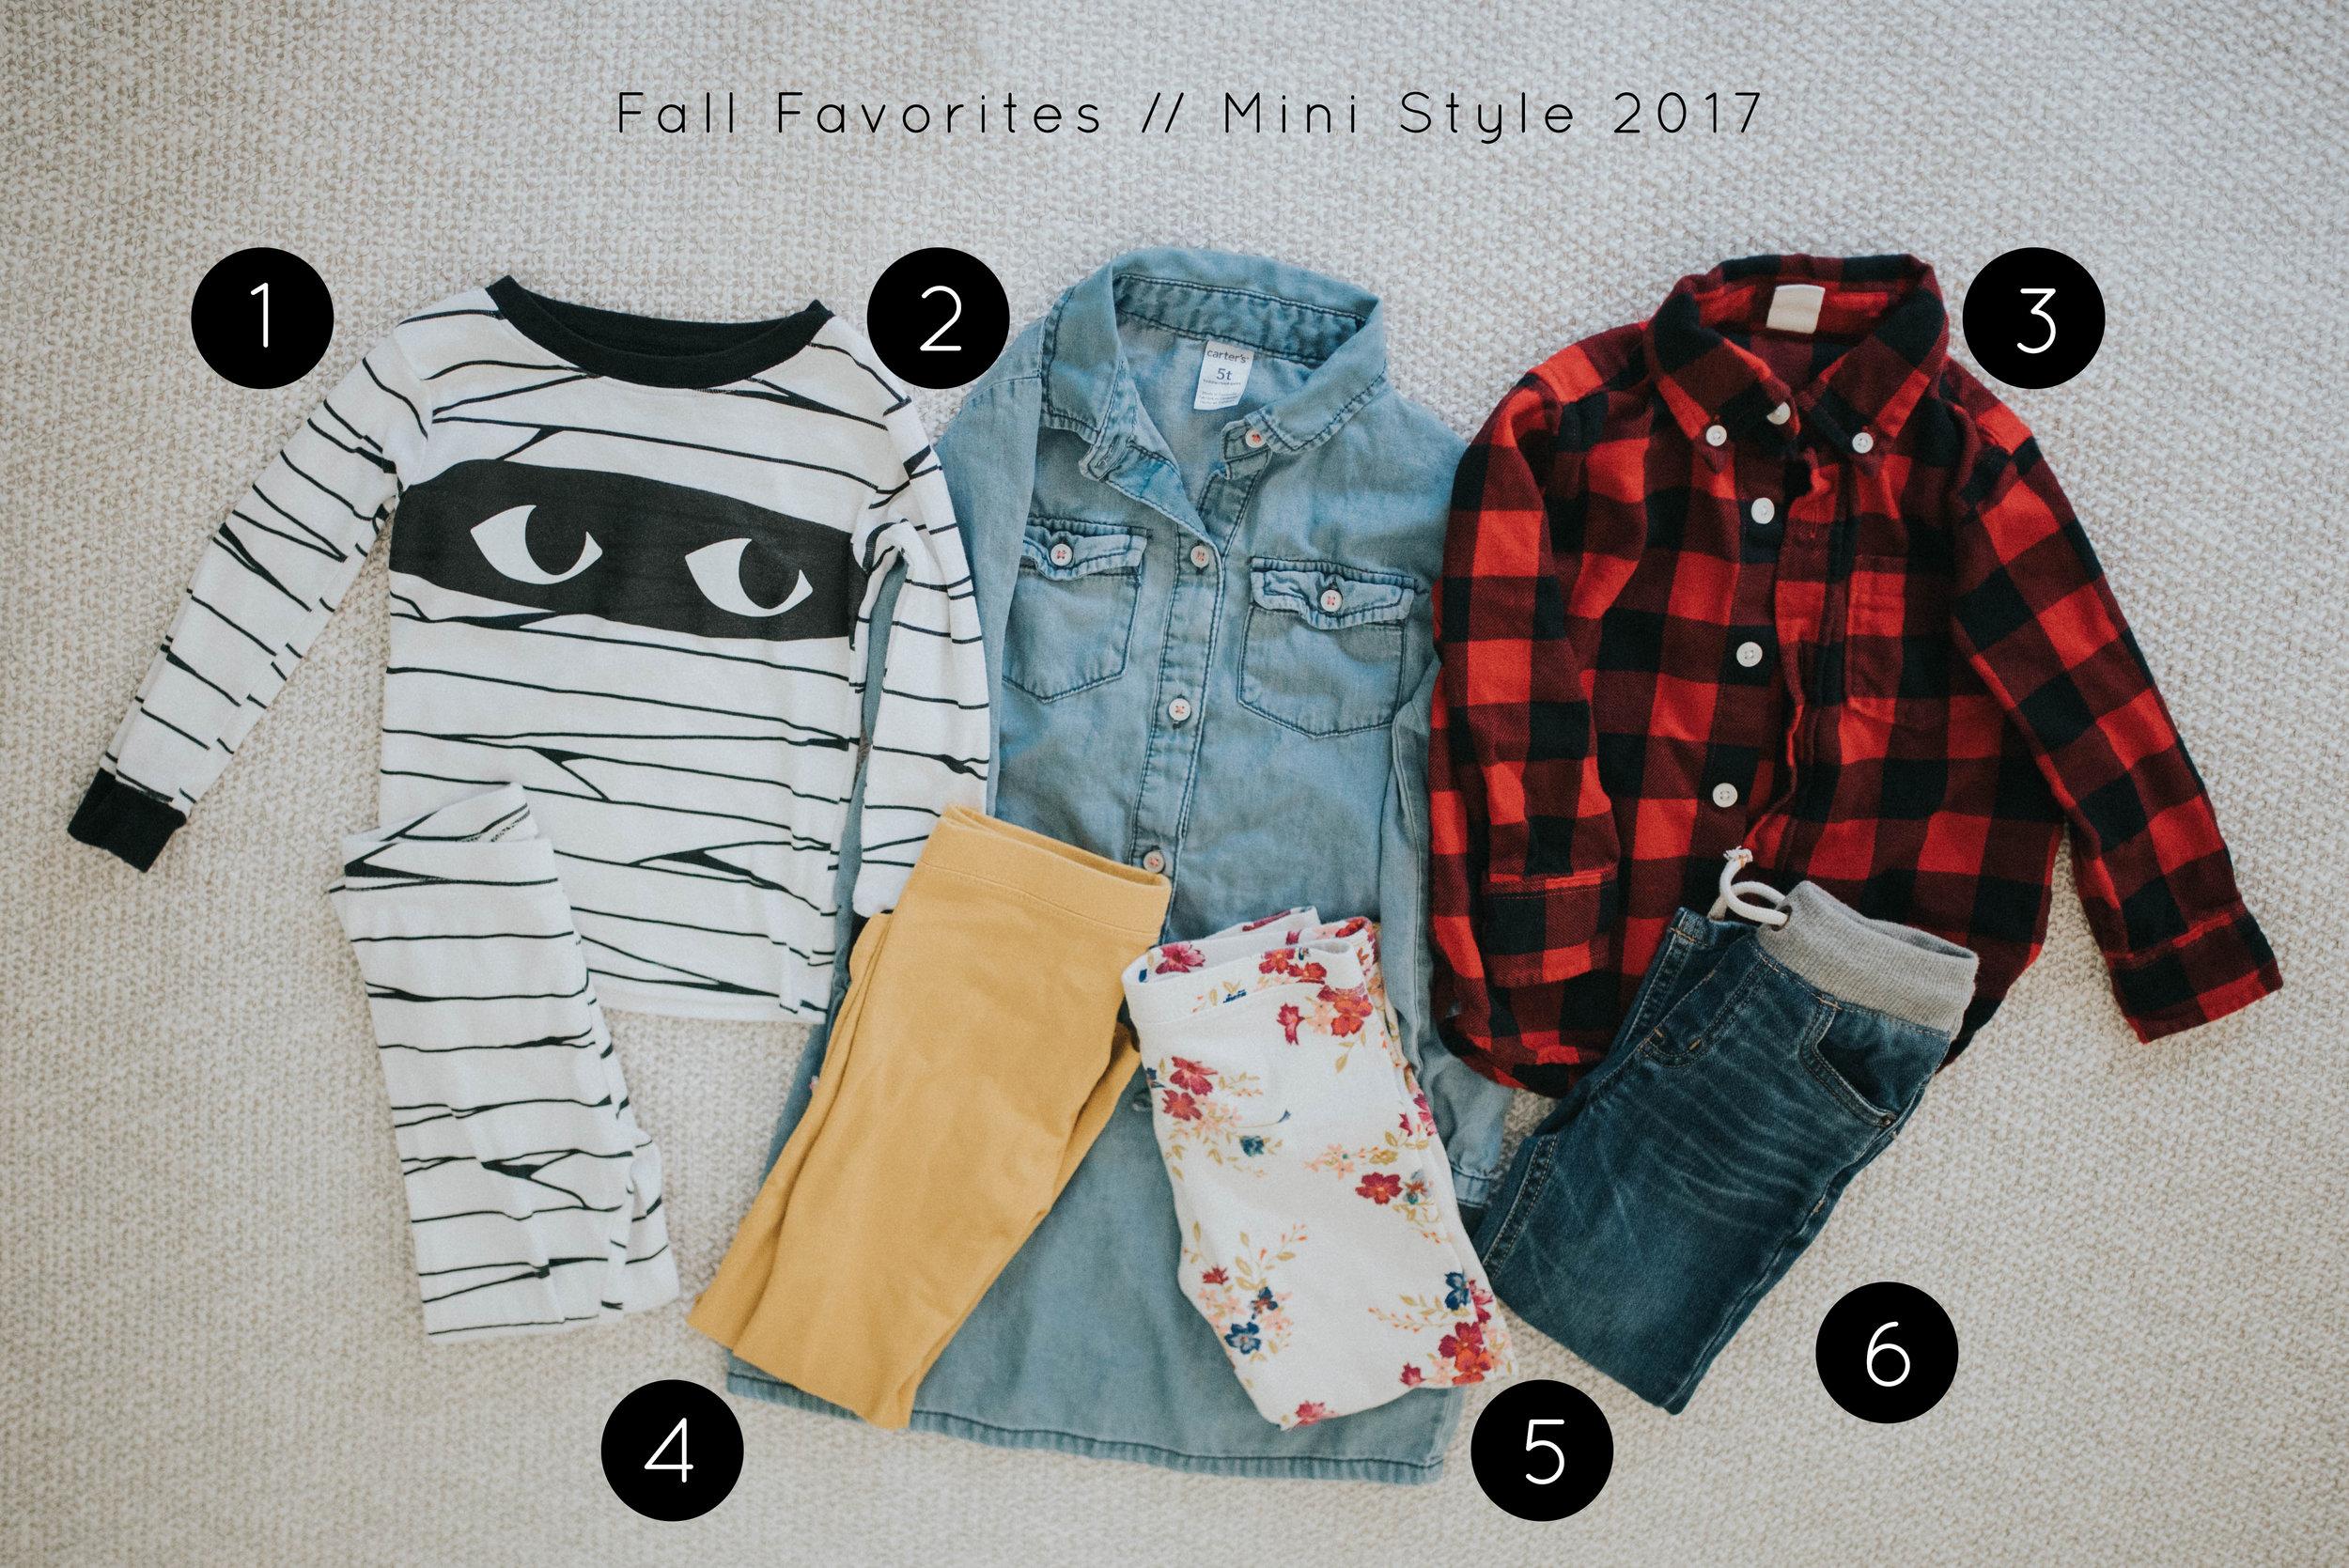 fall-favorites-mini-style-2017.jpg